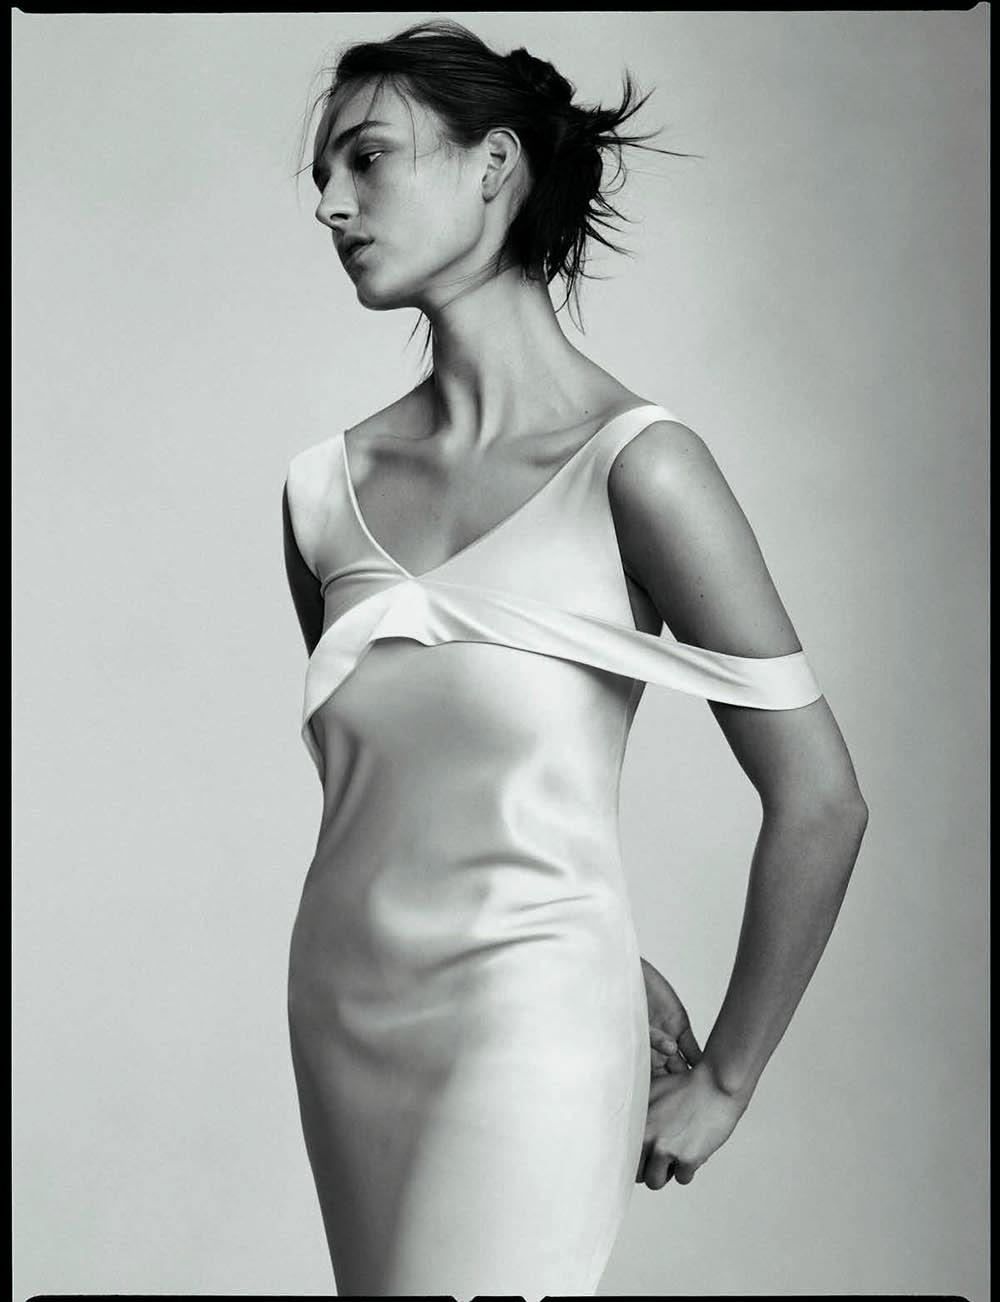 Julia Bergshoeff by Stas Komarovski for Vogue Poland March 2020